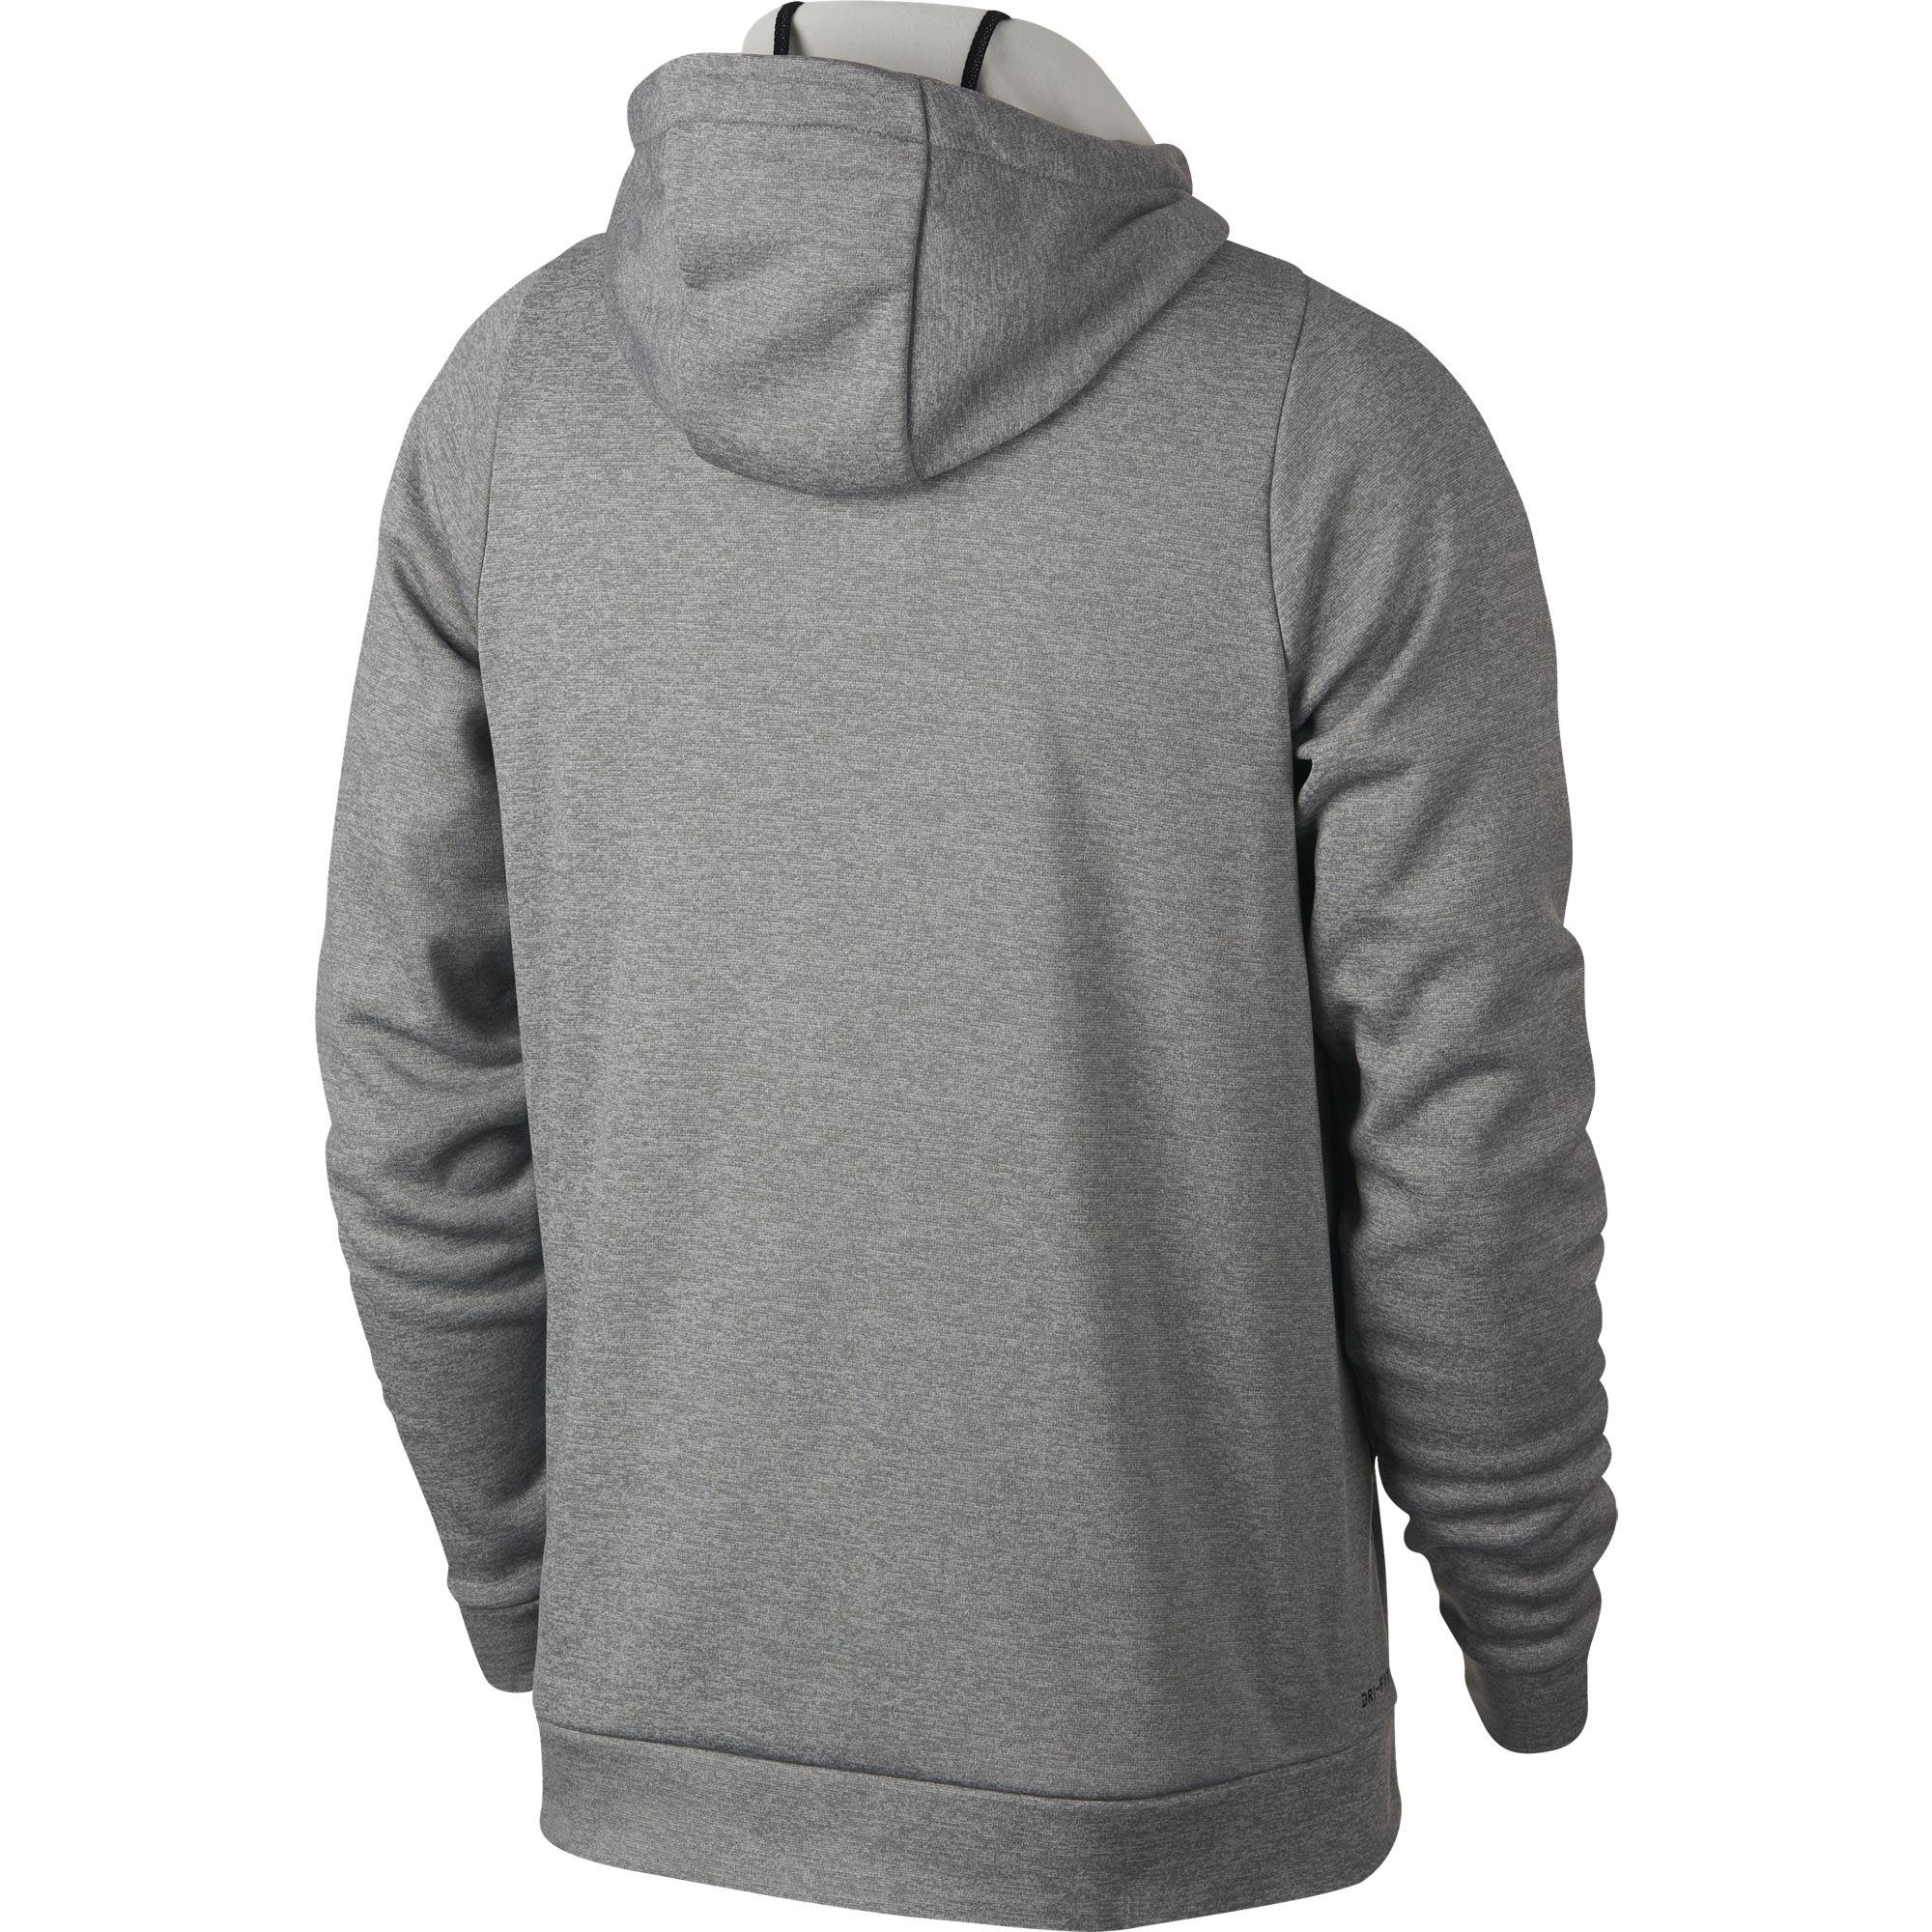 Nike Mens Dry Training Hoodie - Dark Grey Heather Black - Tennisnuts.com 0fae4e0c4